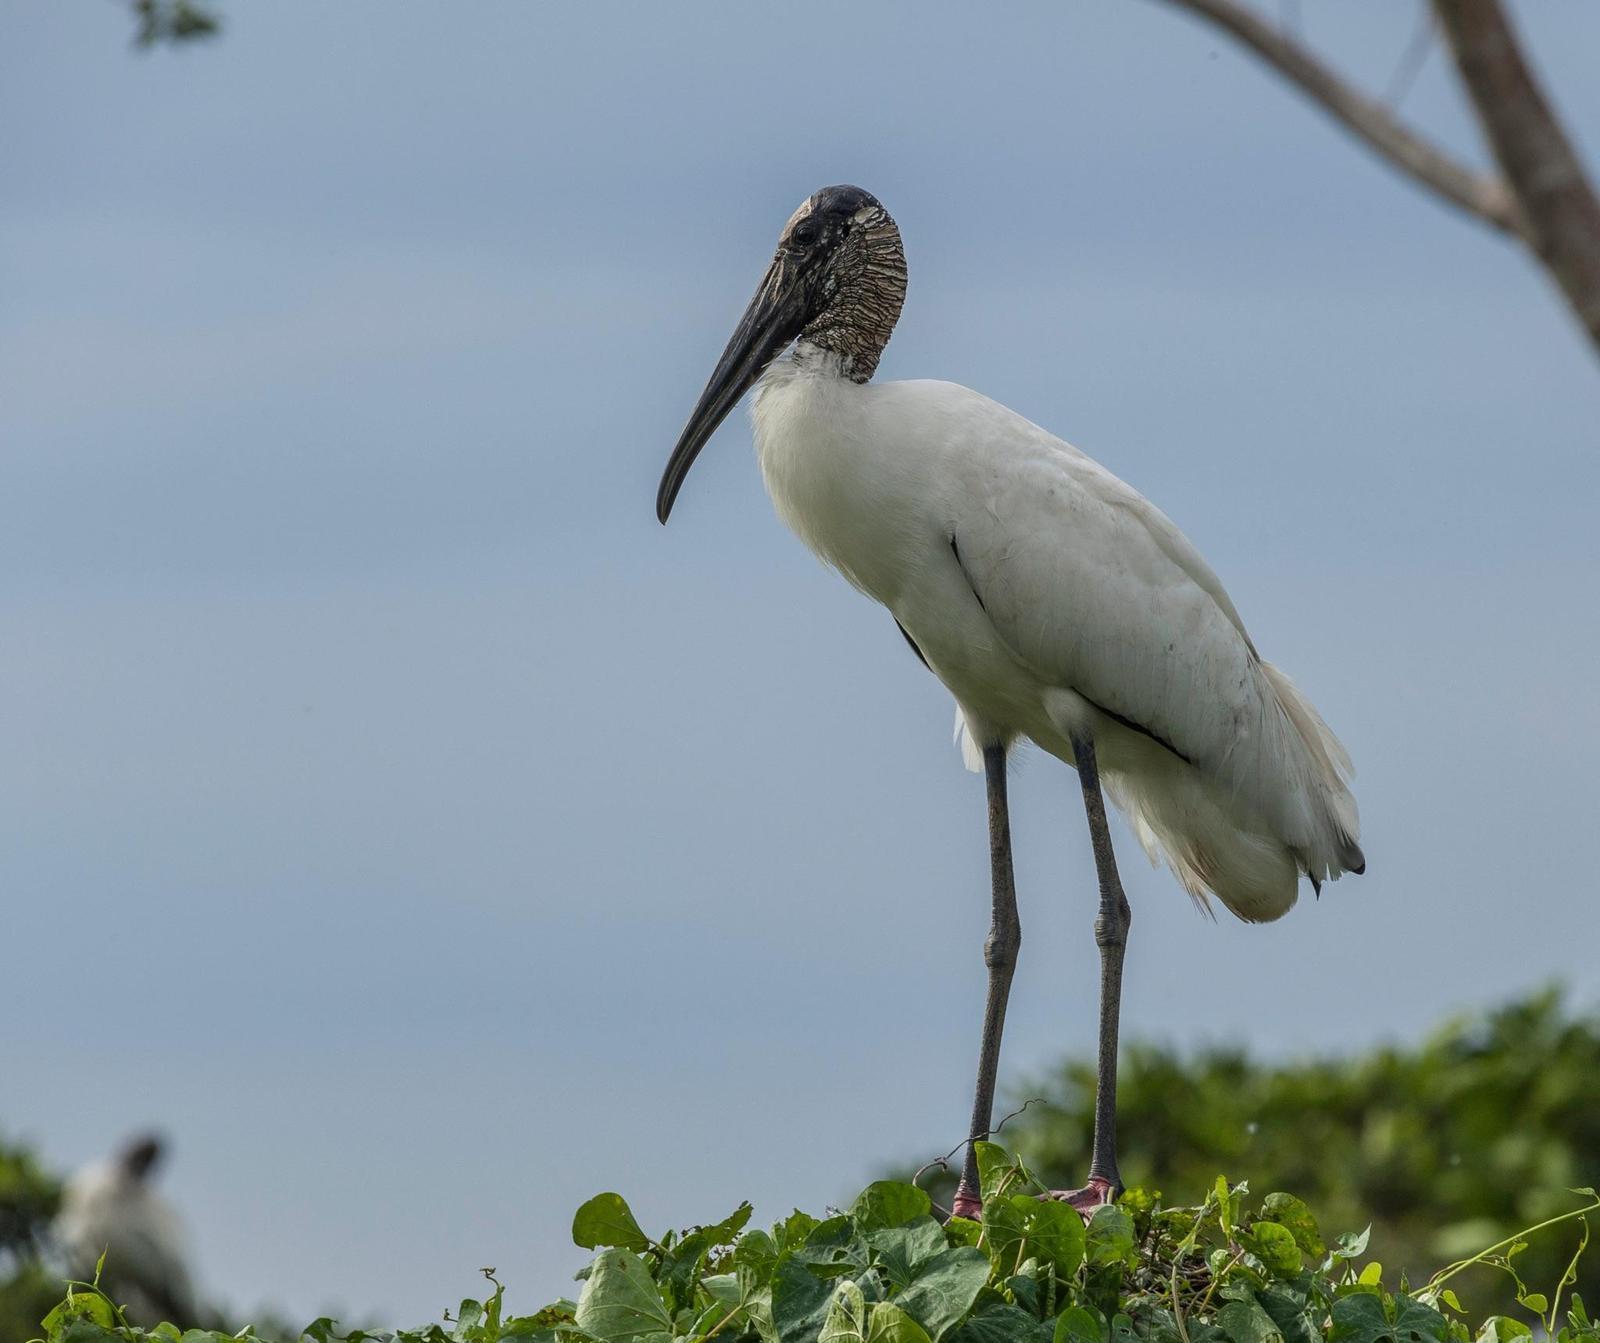 Wood Stork Photo by Paul Demers